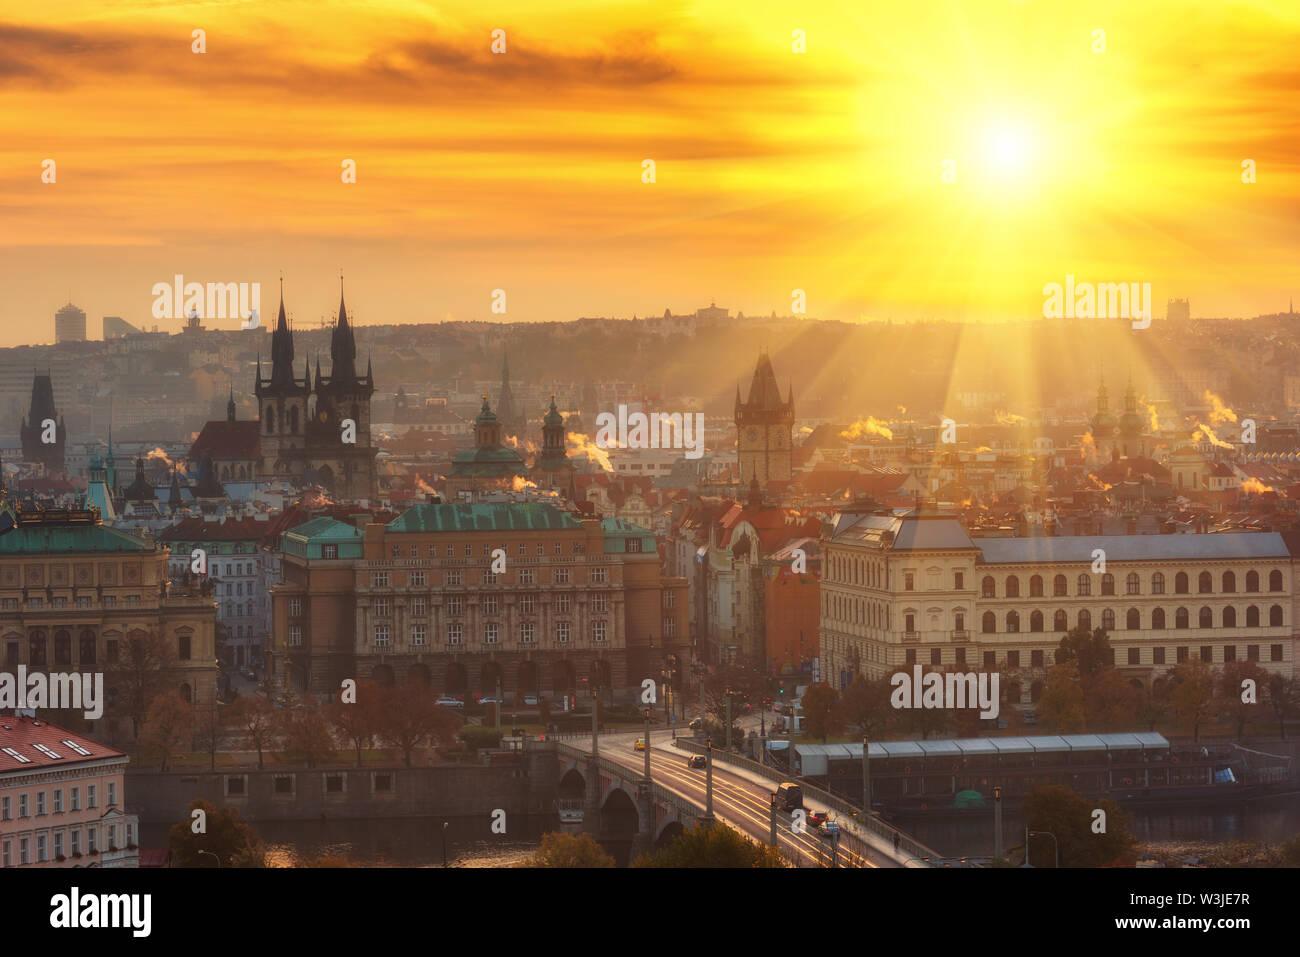 Golden sunrise over Prague old town, colorful cityscape, Czech Republic - Stock Image